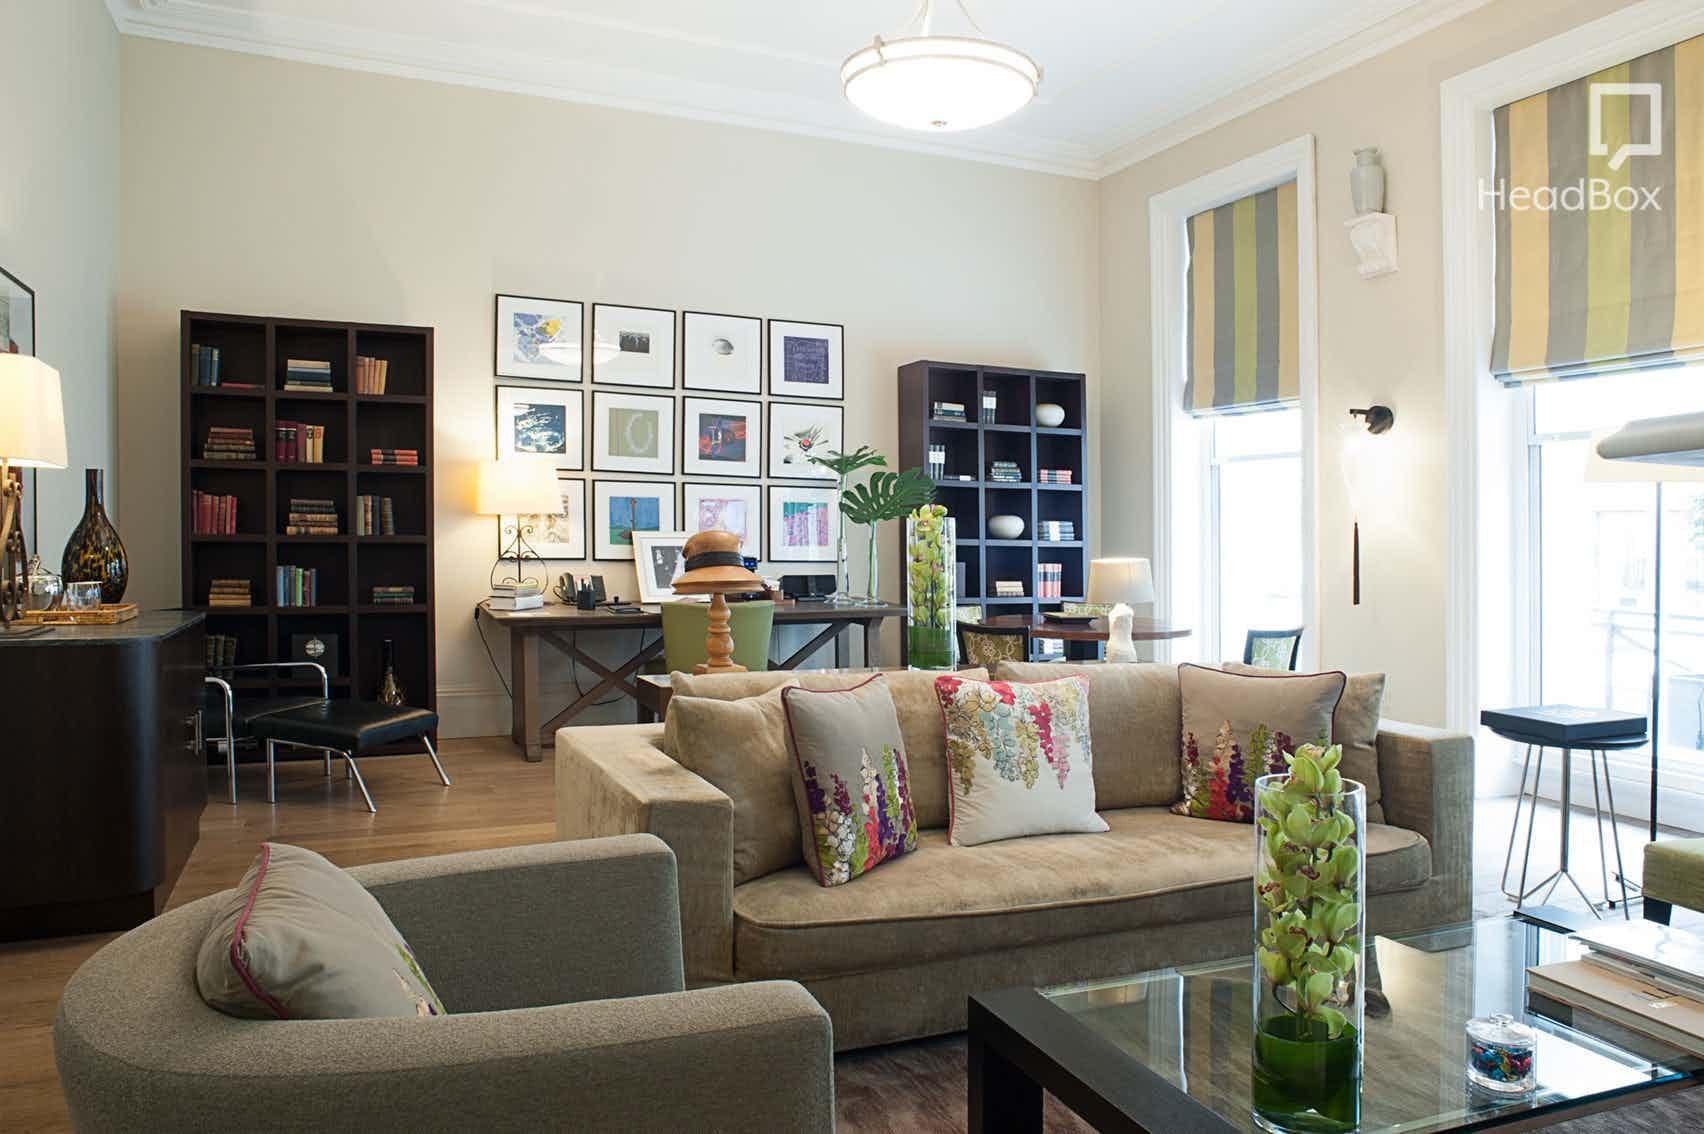 Hellenic Suite, Brown's Hotel Mayfair